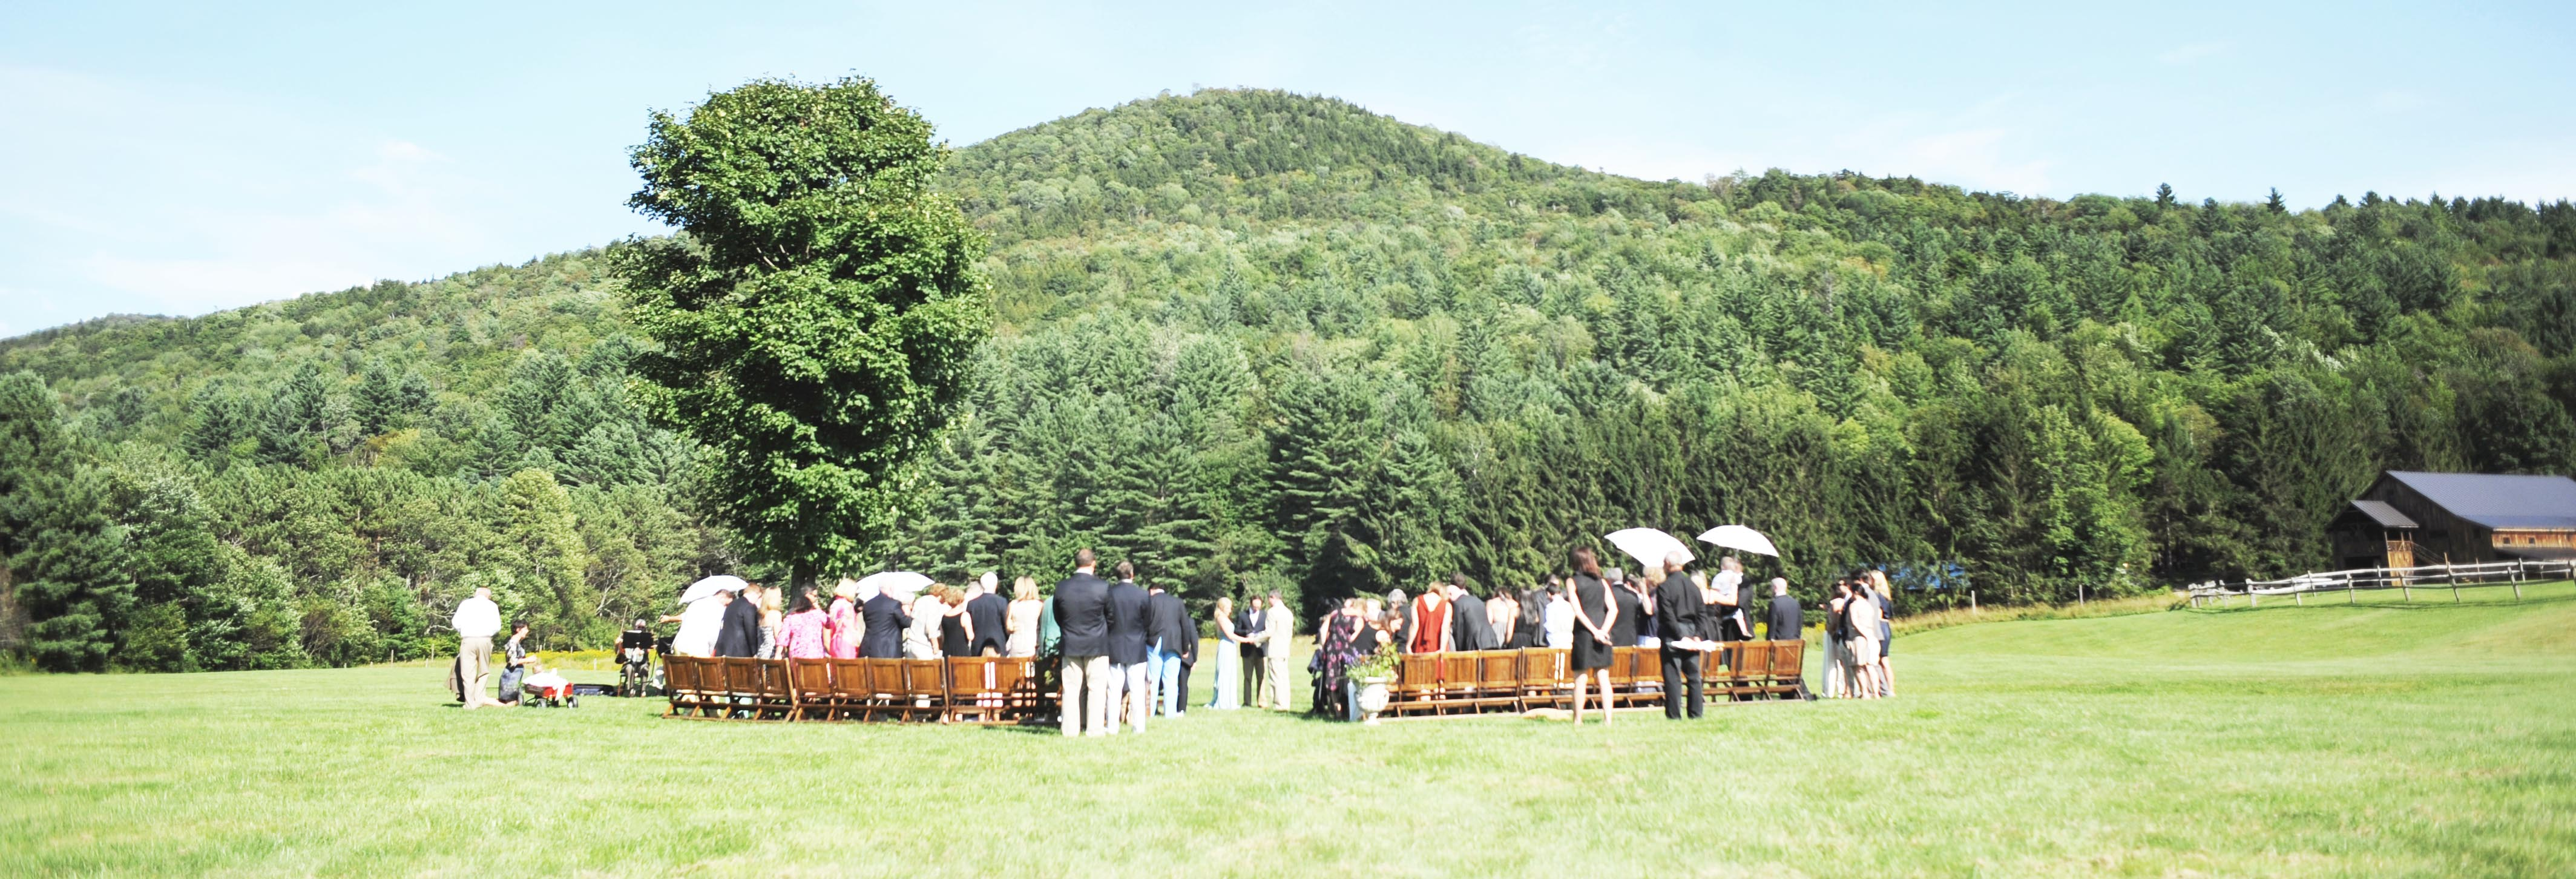 Riverside_Farm_Wedding_Ceremony